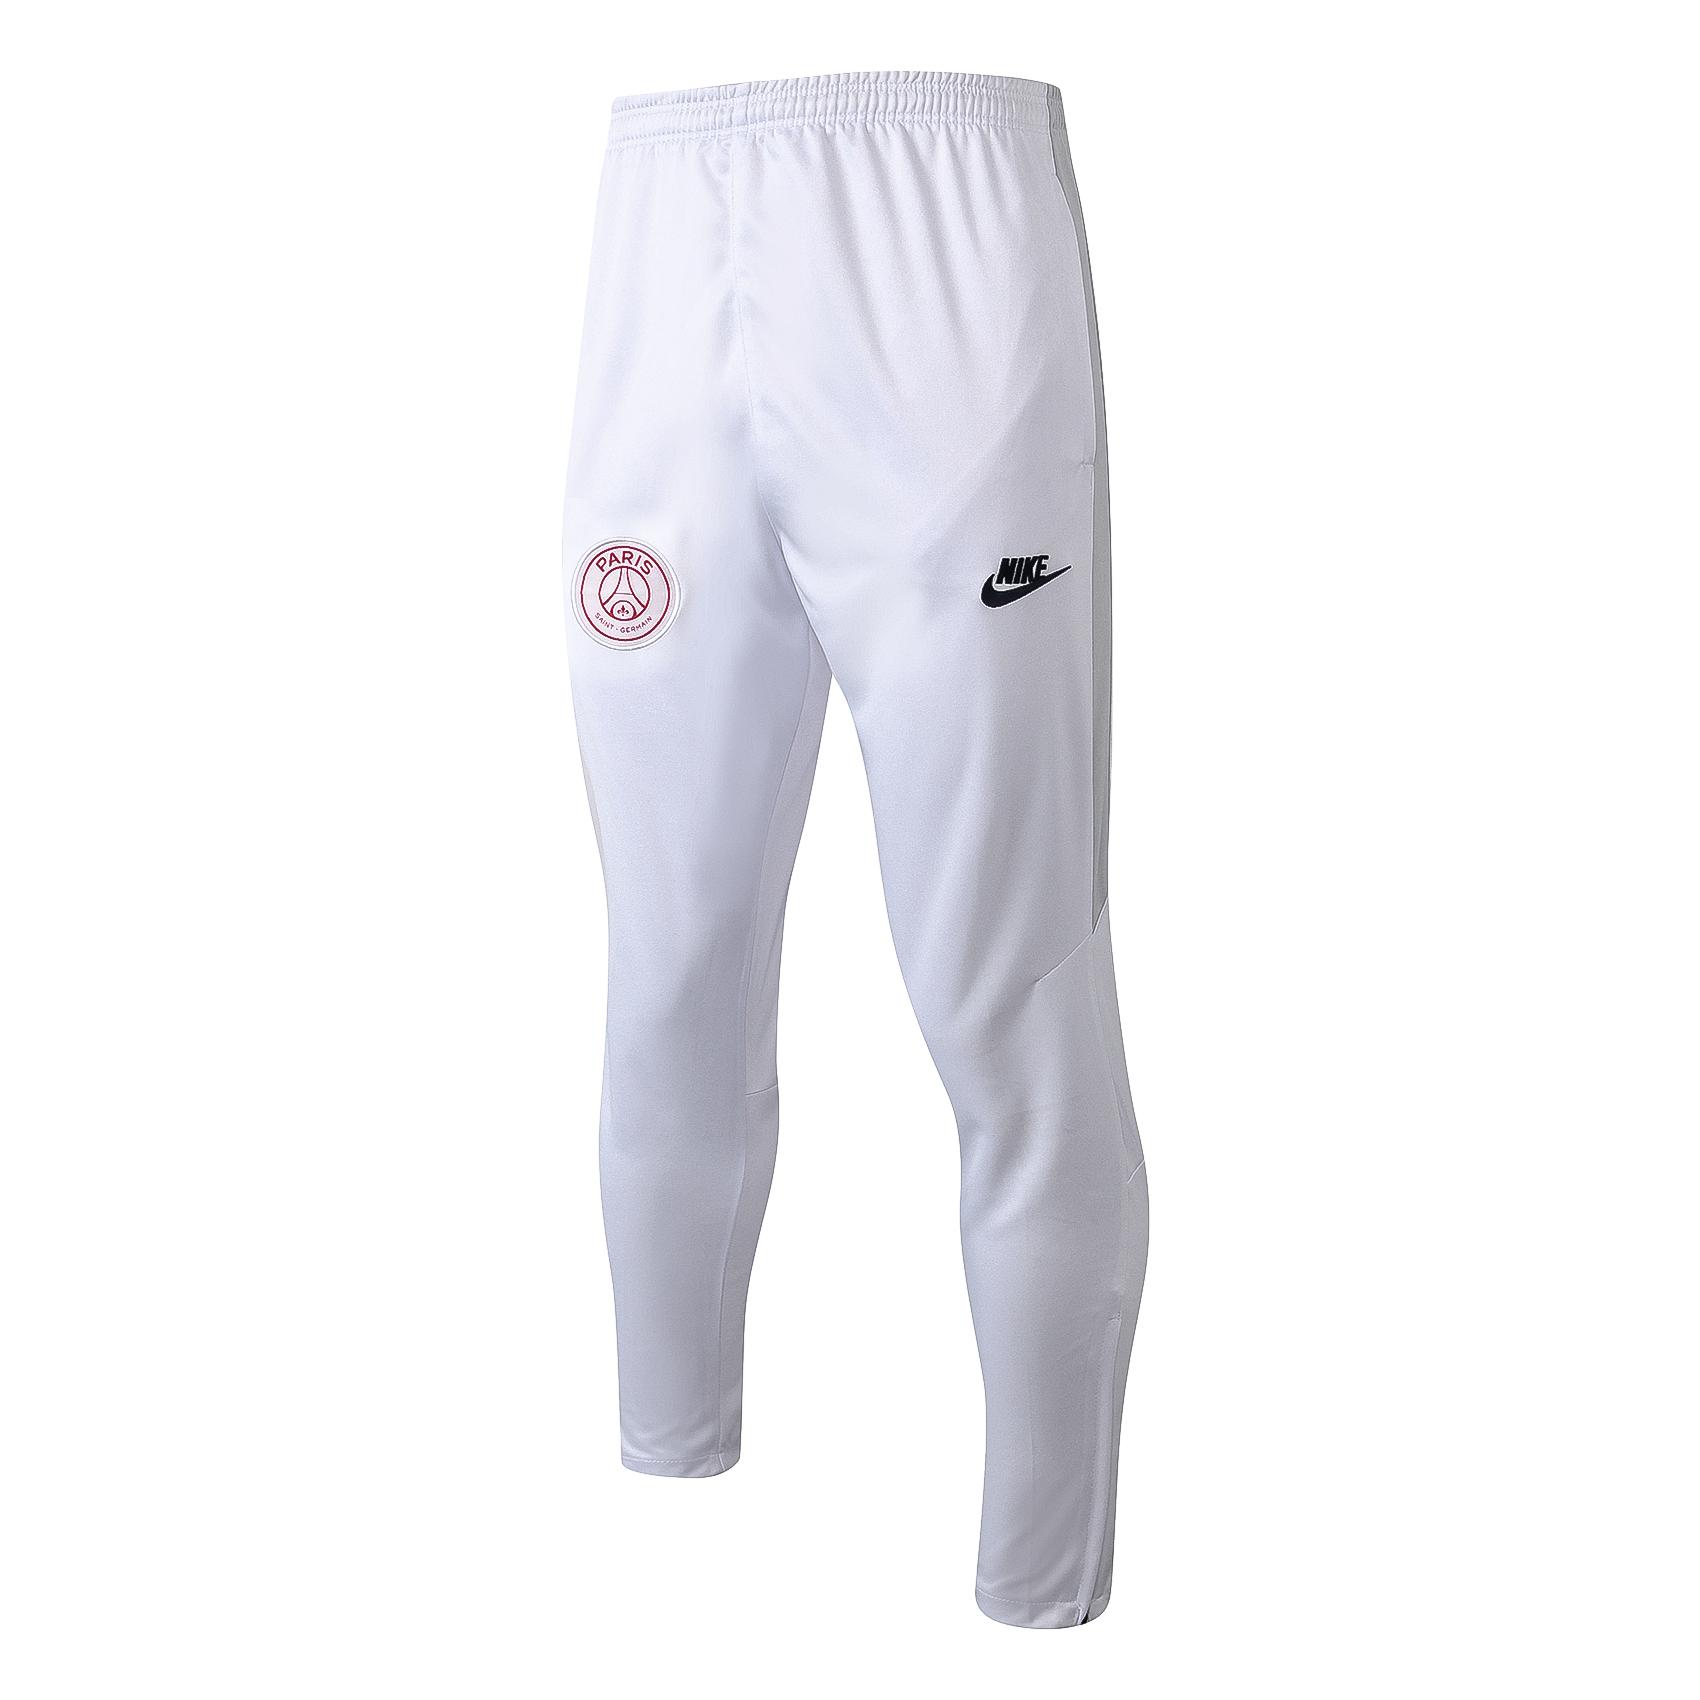 2019-2020 Marseille Woven Pants White